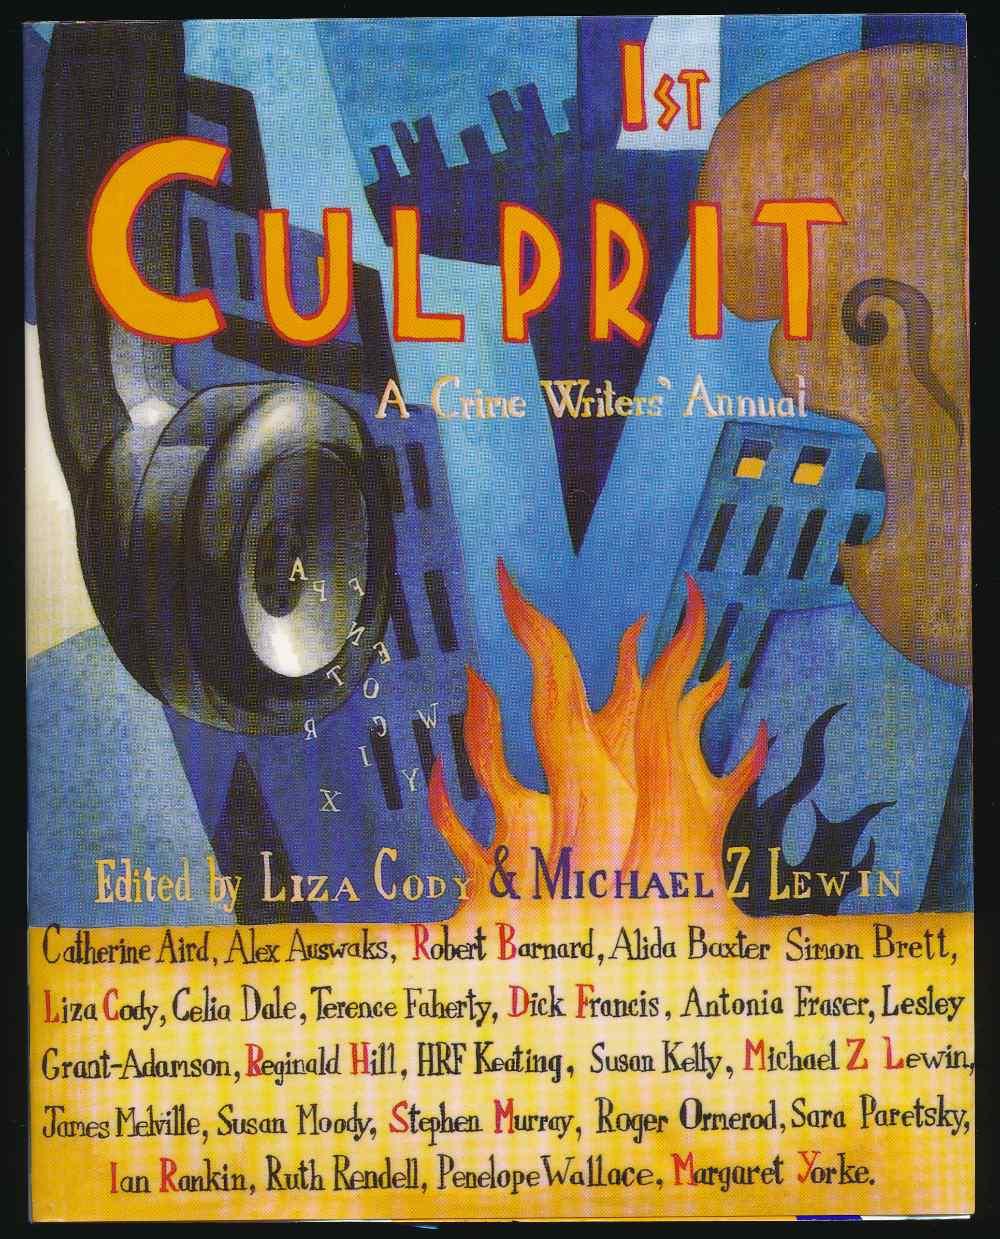 1st culprit : an anthology of crime stories